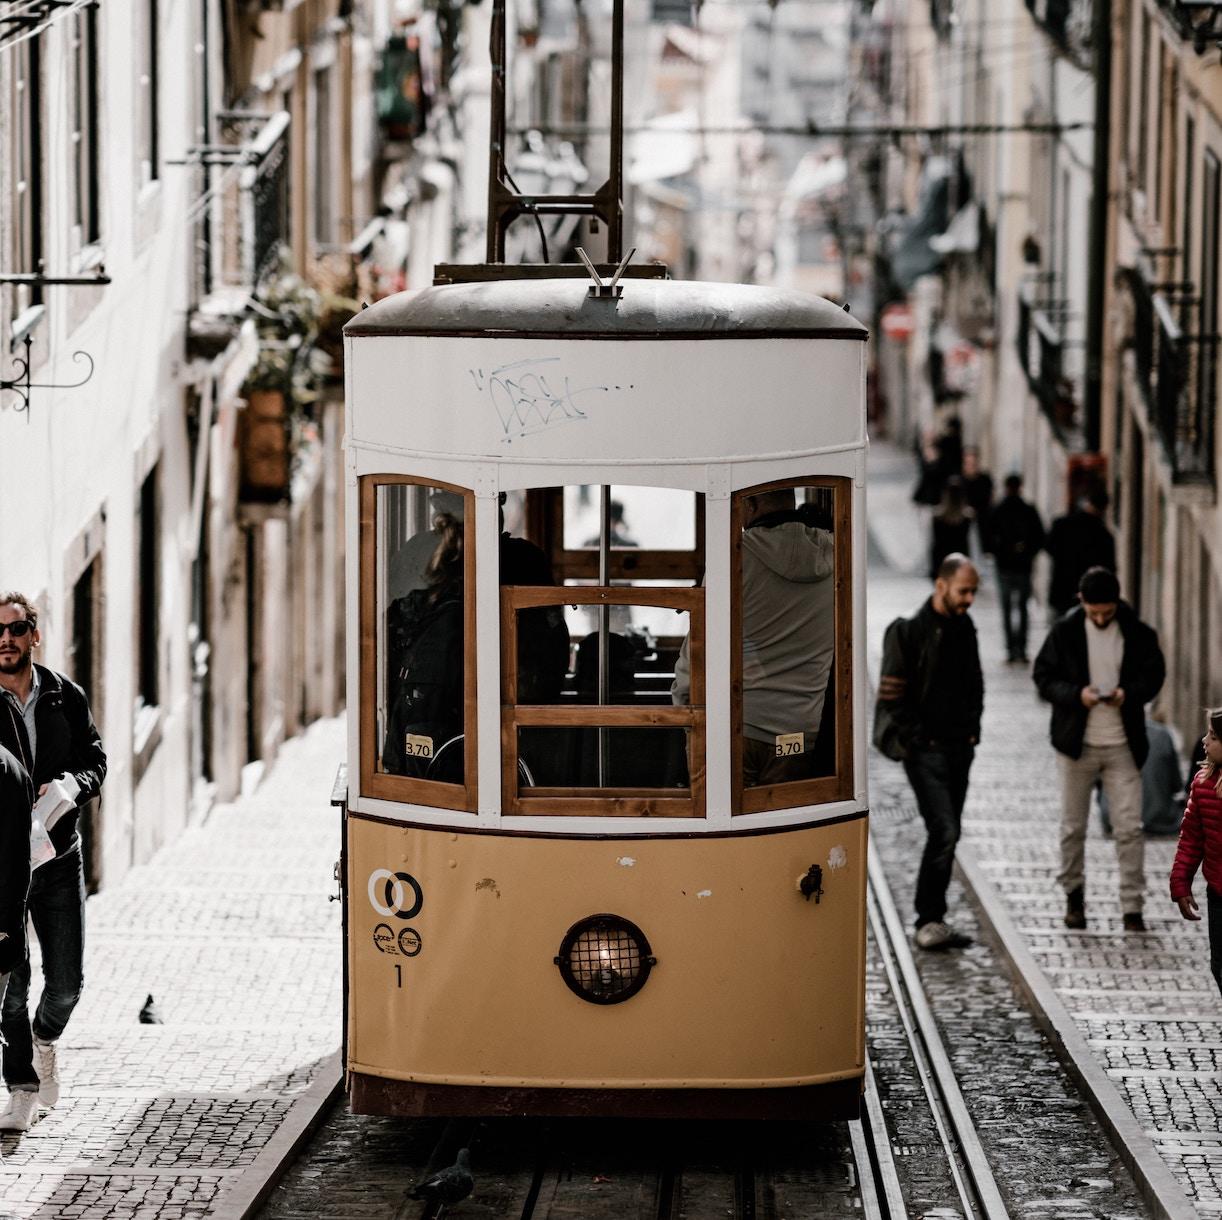 Photo: Lisbon, Portugal | Annie Spratt, Unsplash